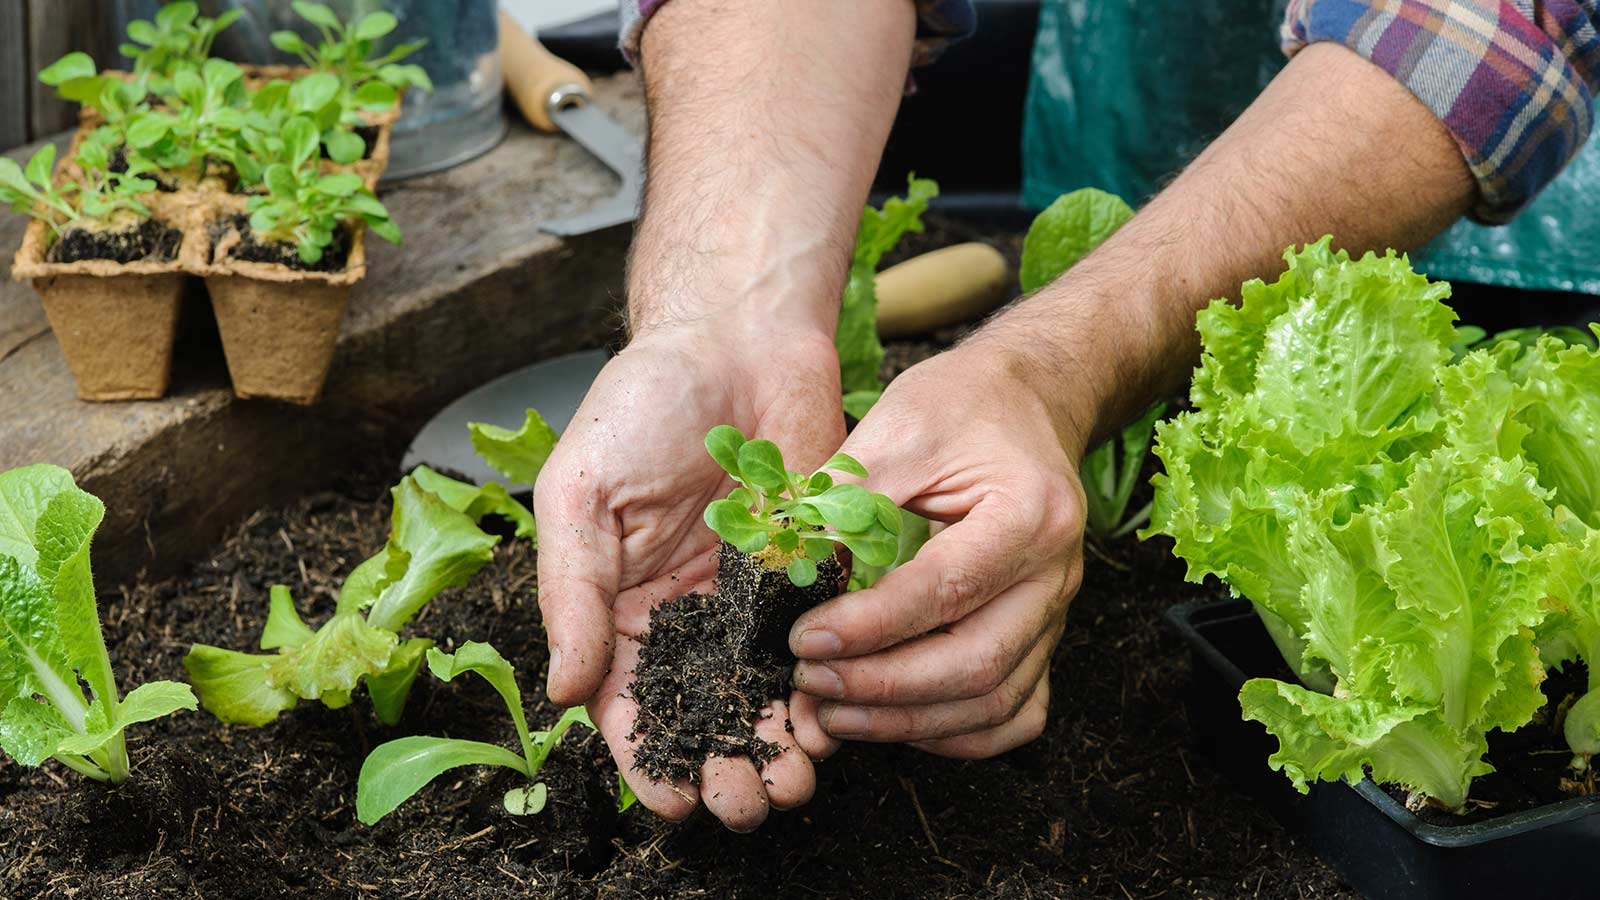 A man planting a lettuce seedling in an outdoor garden.